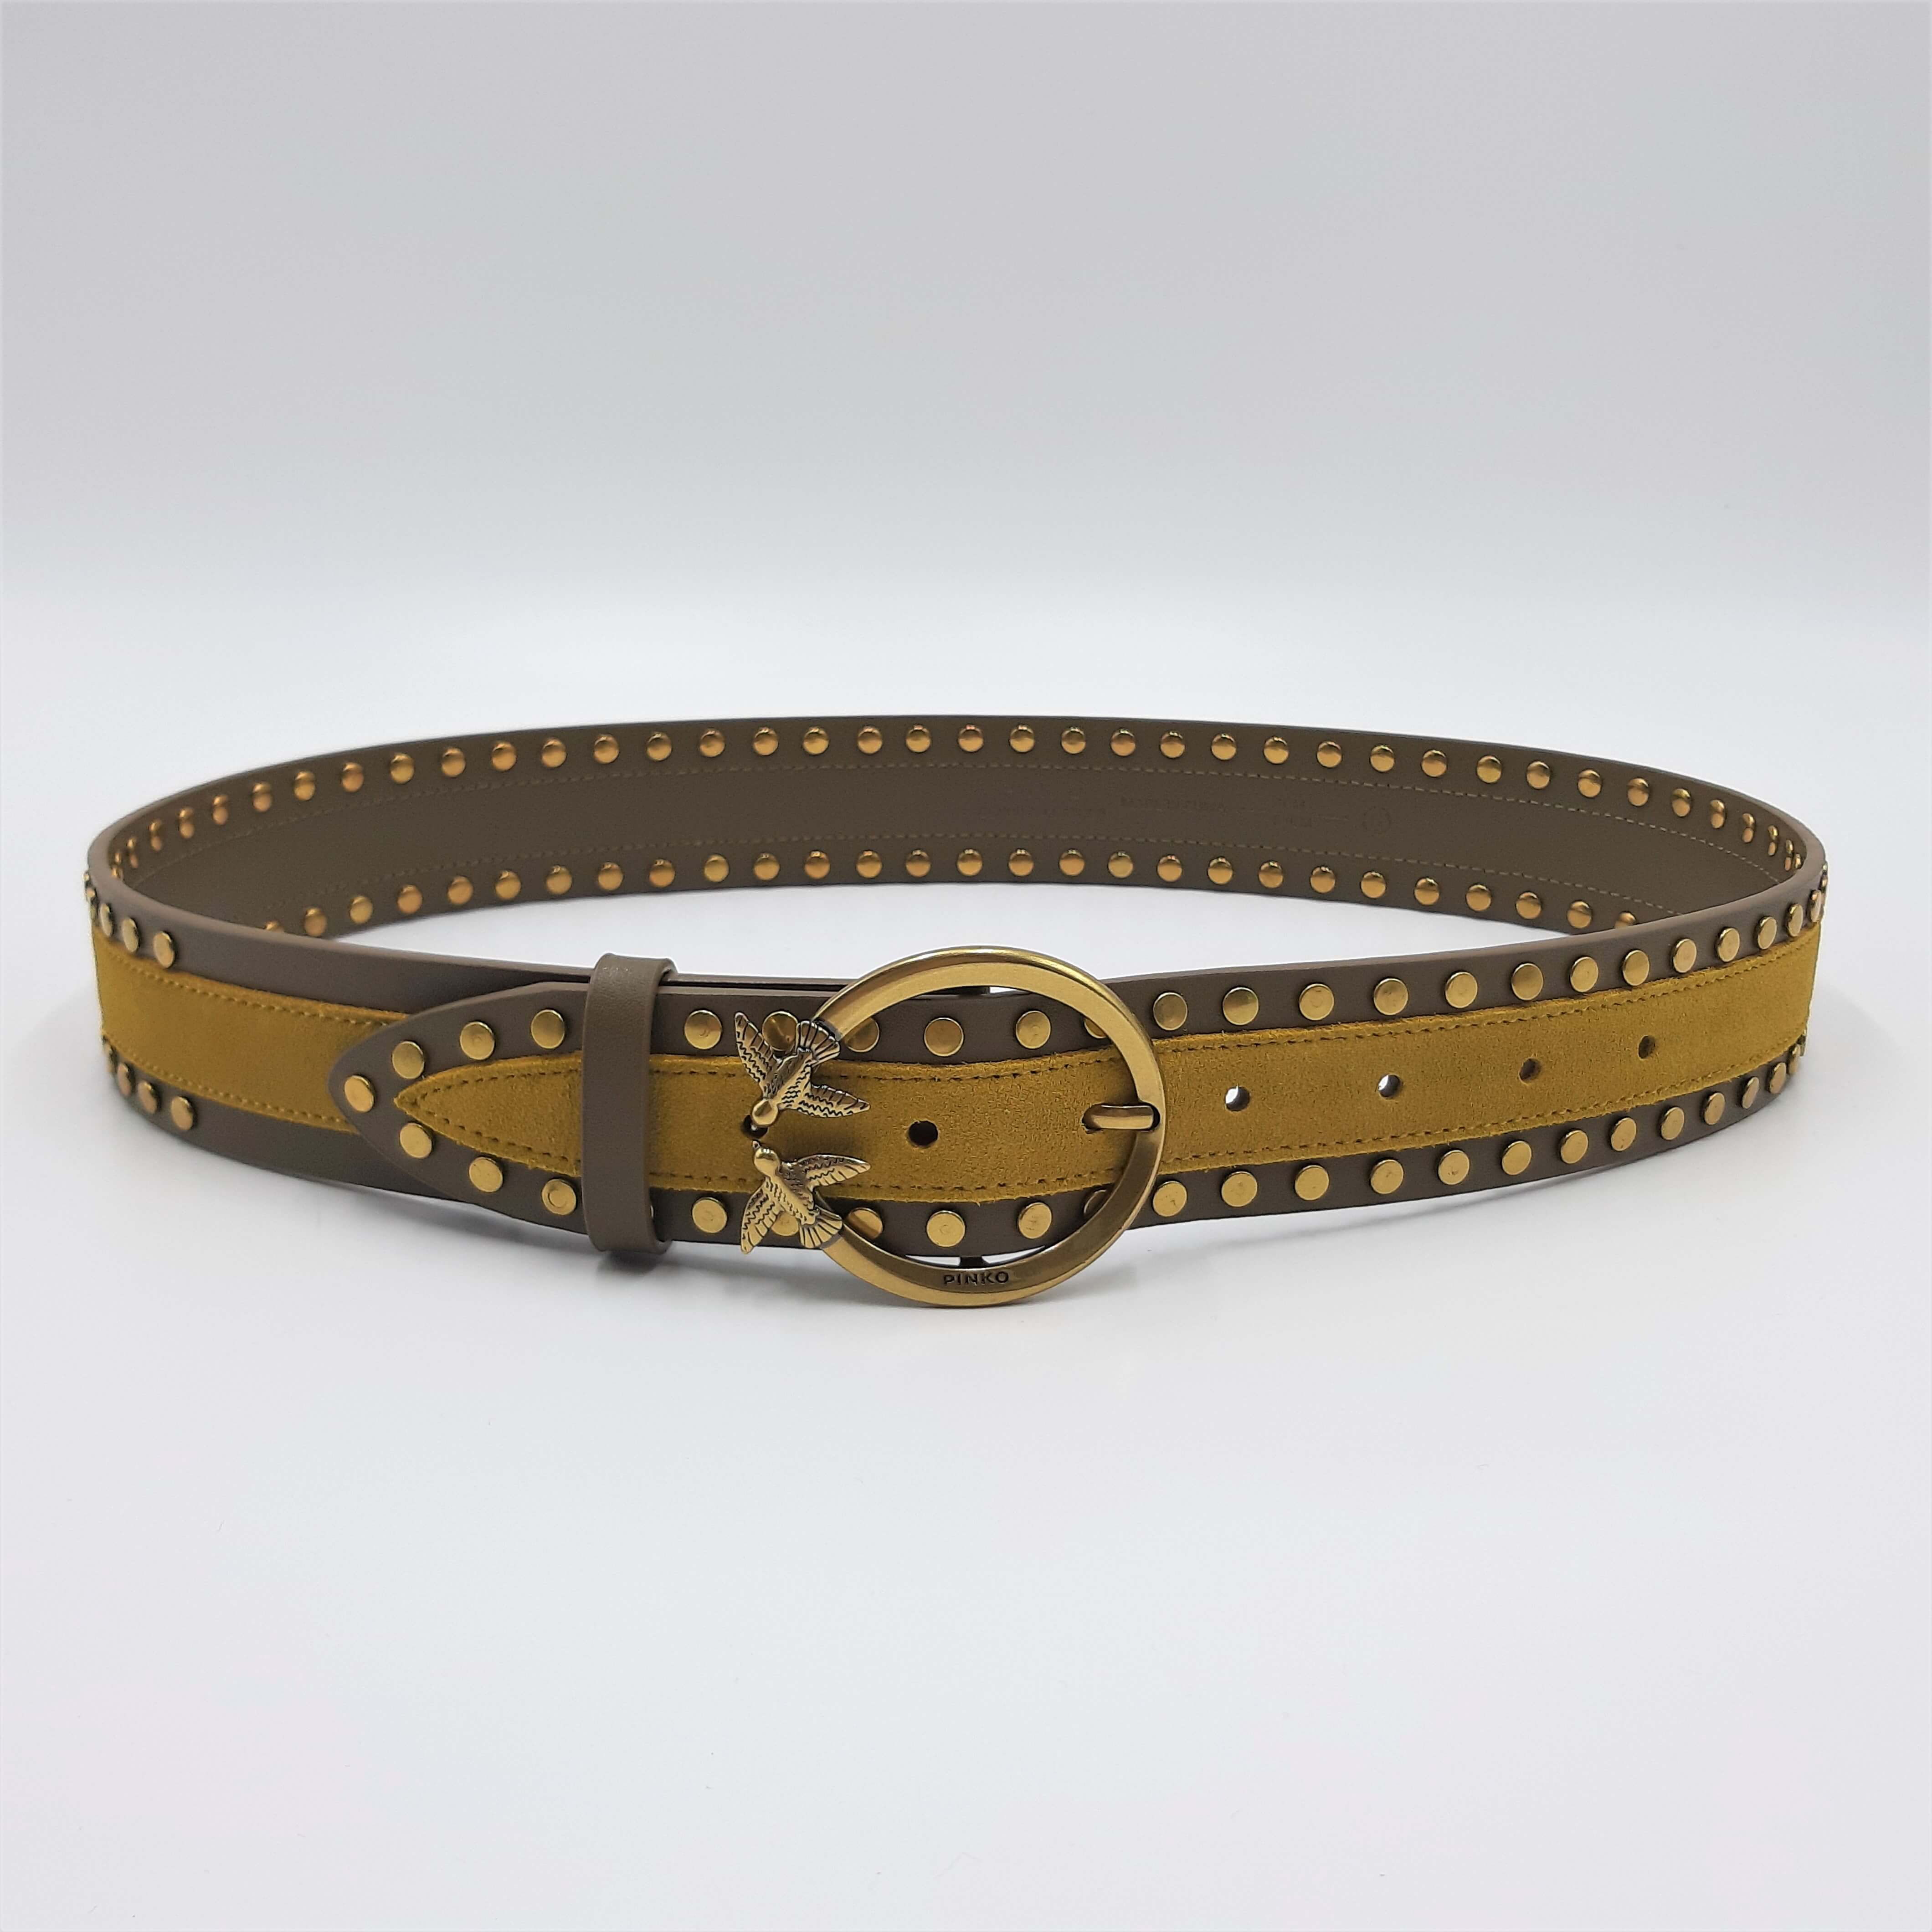 Cintura Love Mix Leather Belt H4 Pinko